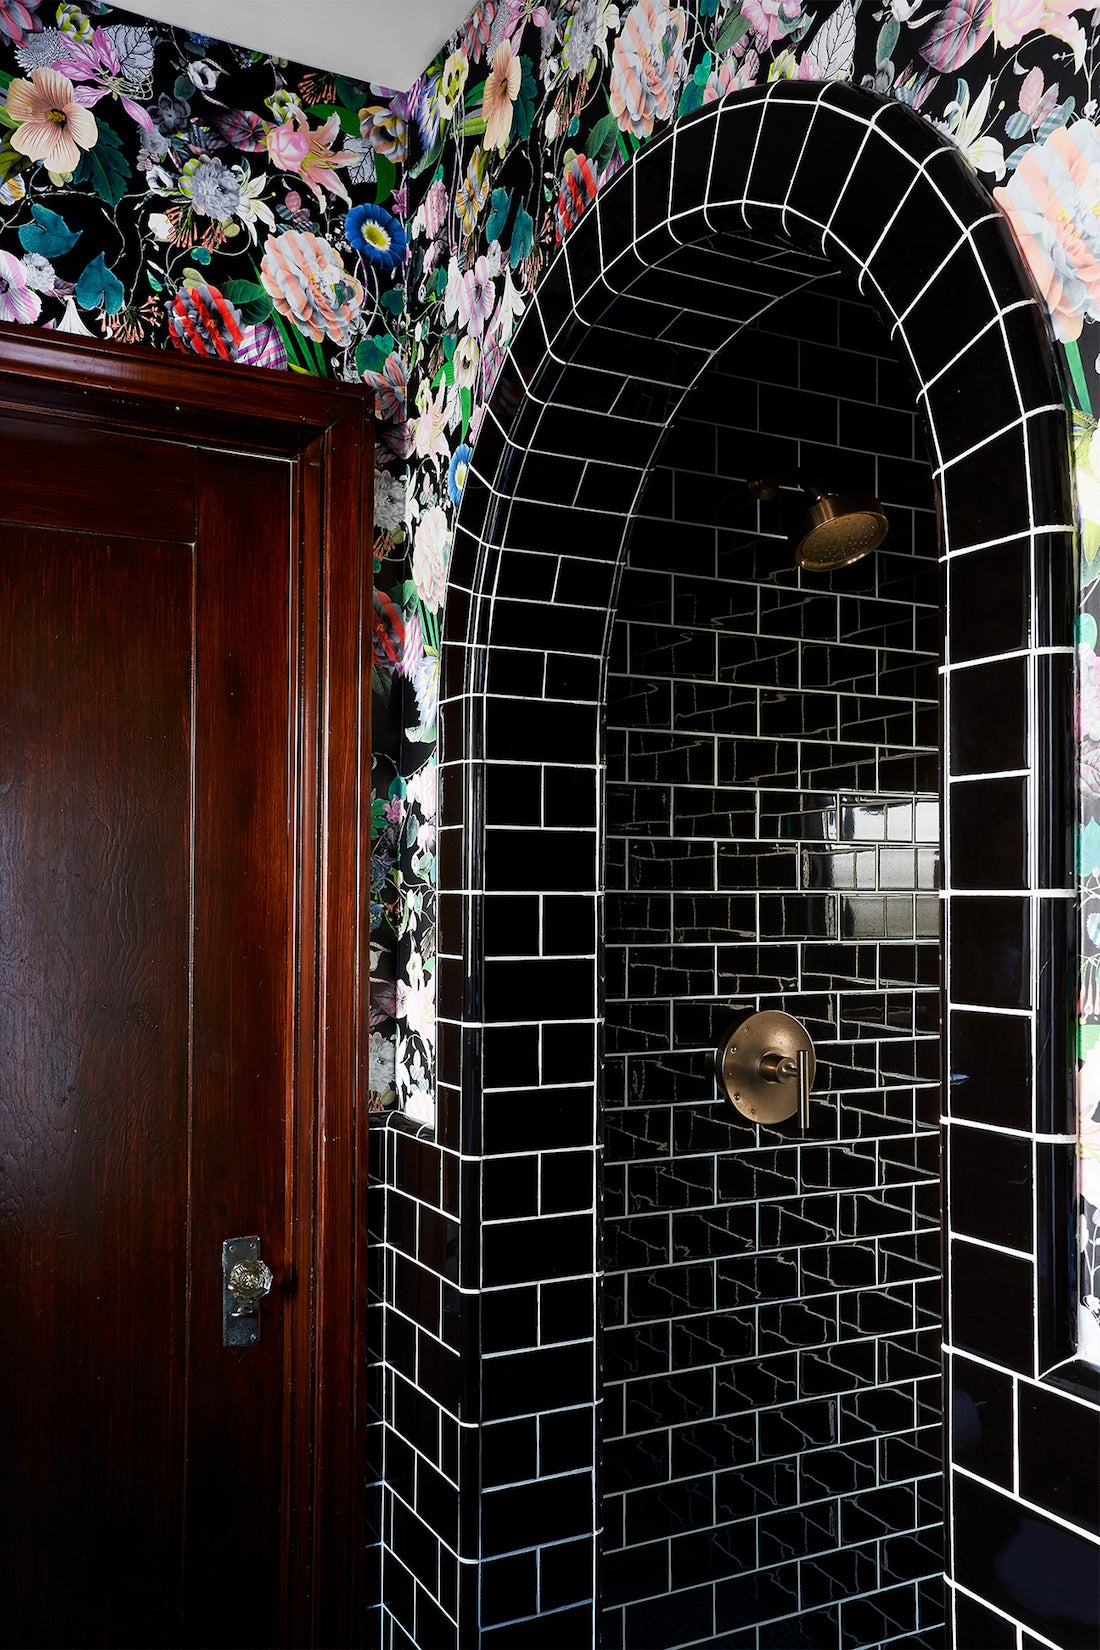 black tile in bathroom archway